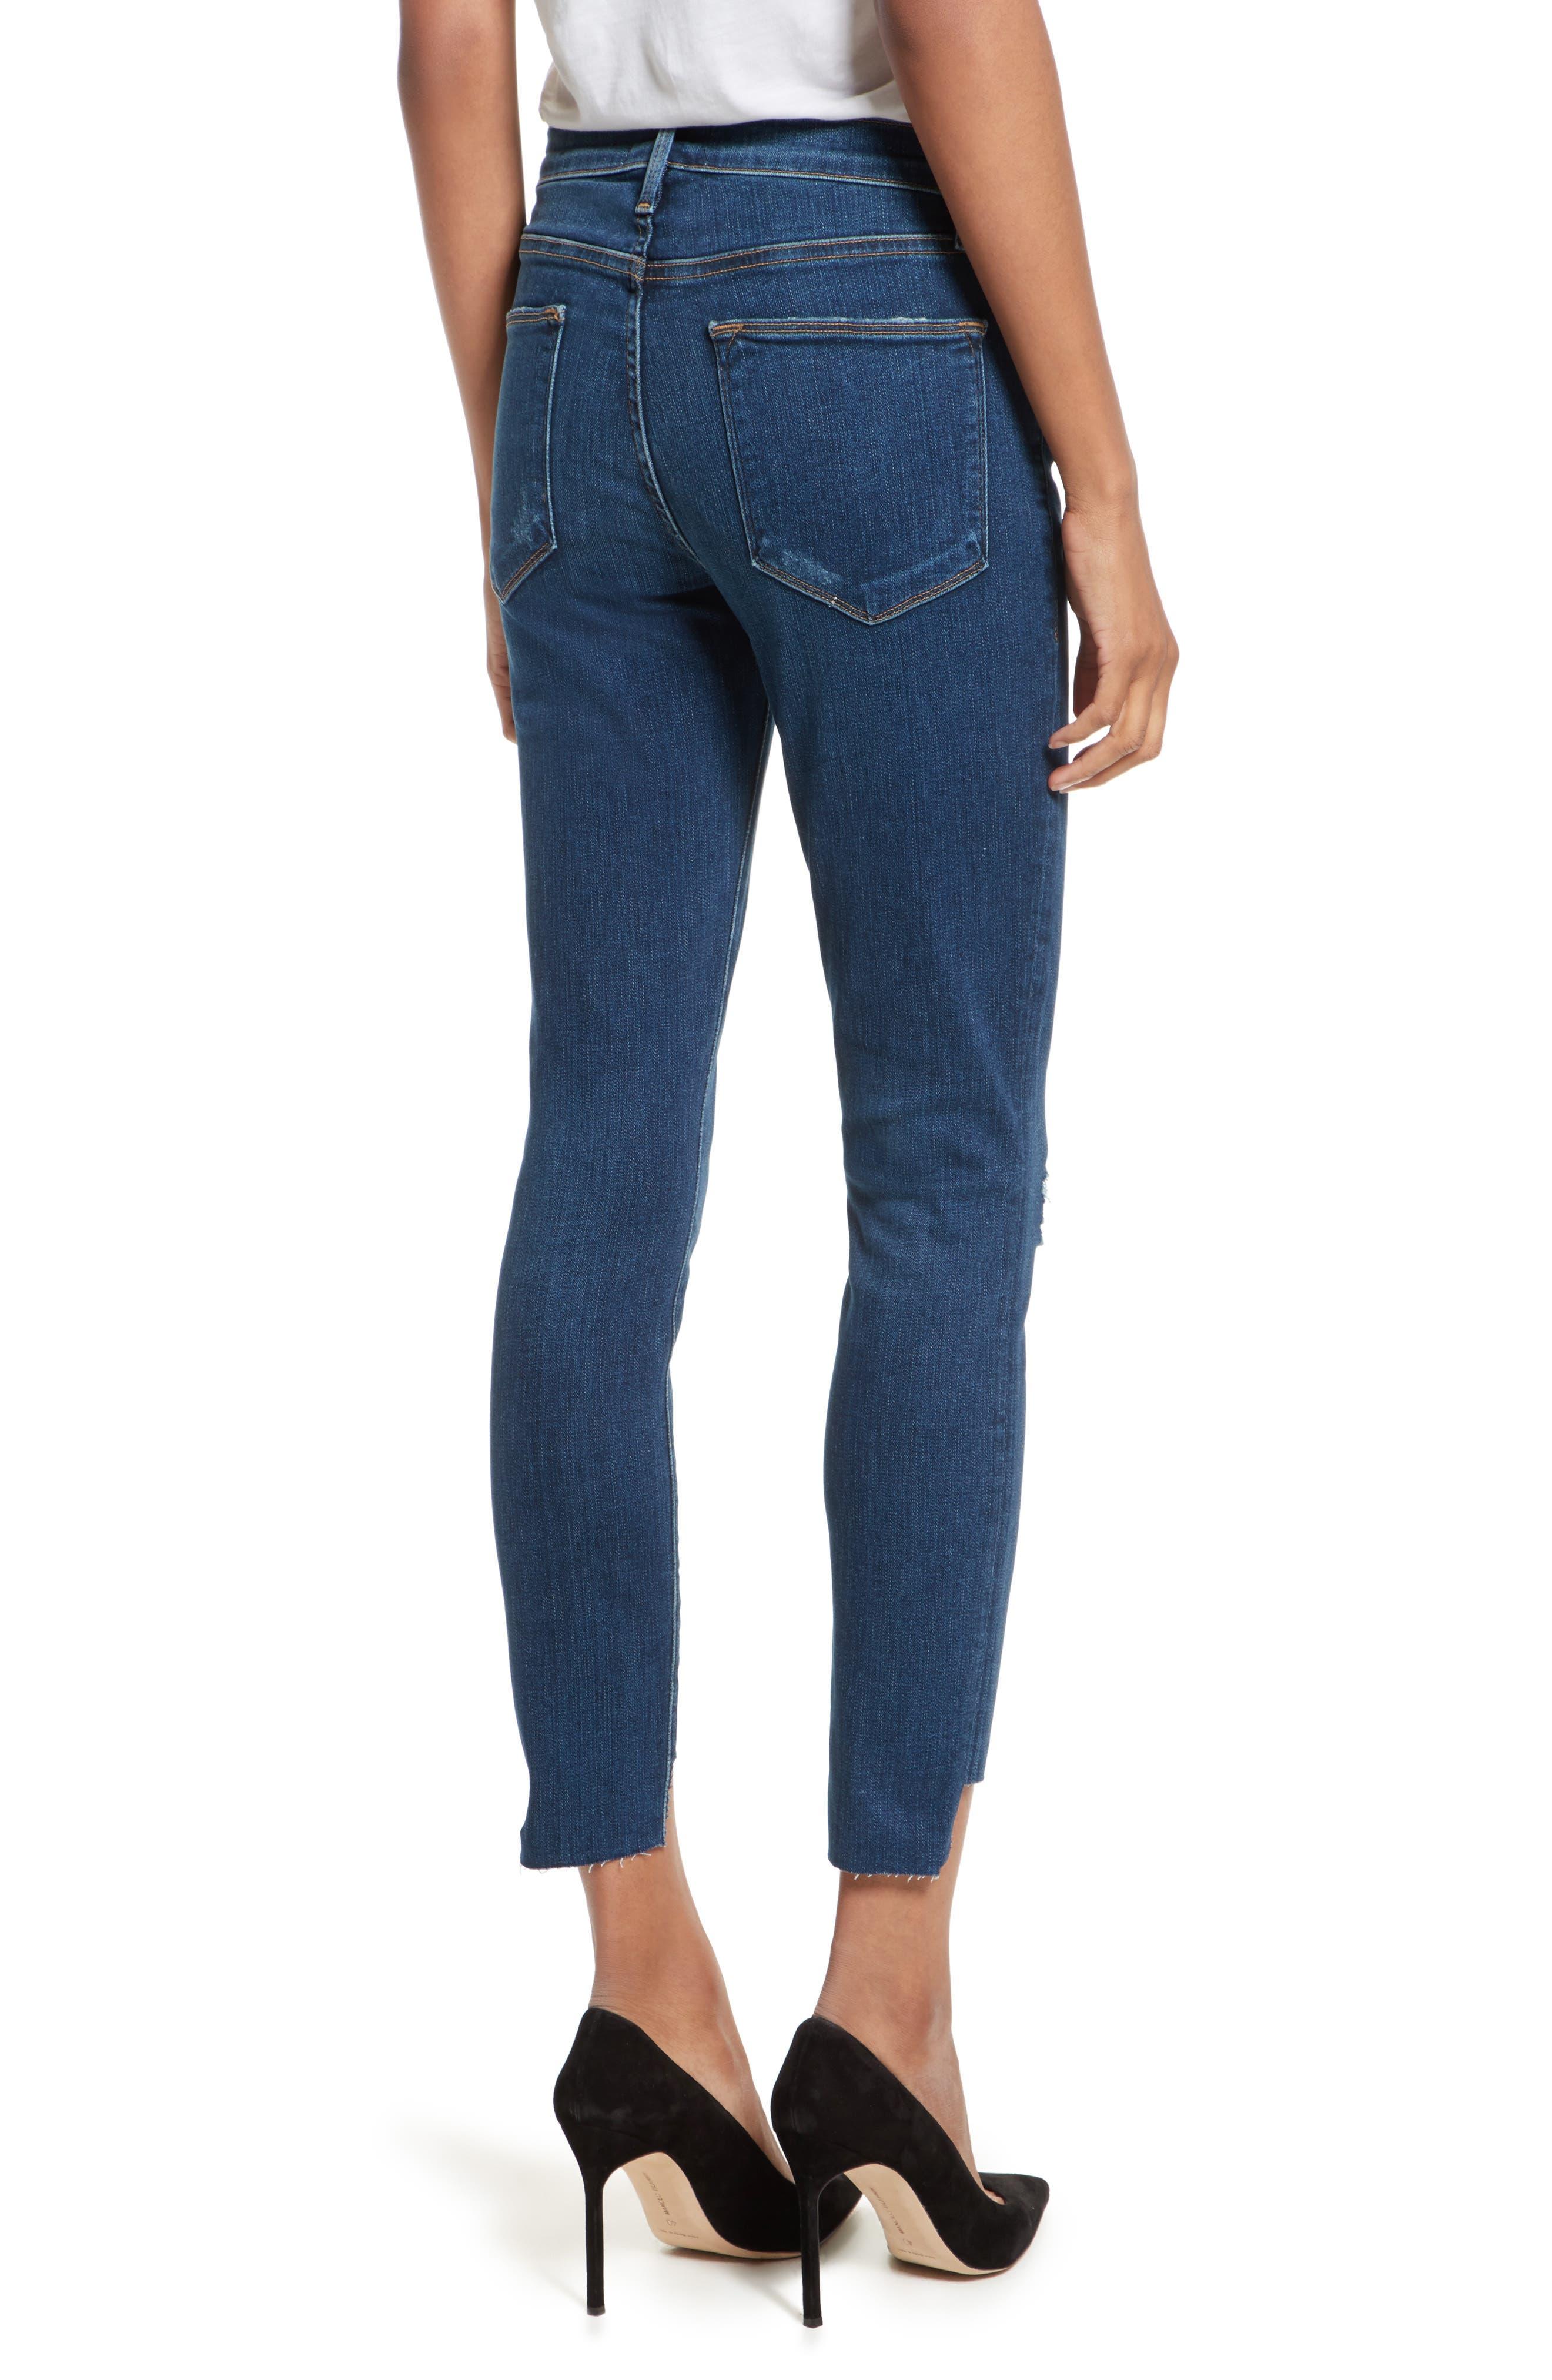 Alternate Image 2  - FRAME Le High High Waist Staggered Hem Slim Jeans (Baisley)